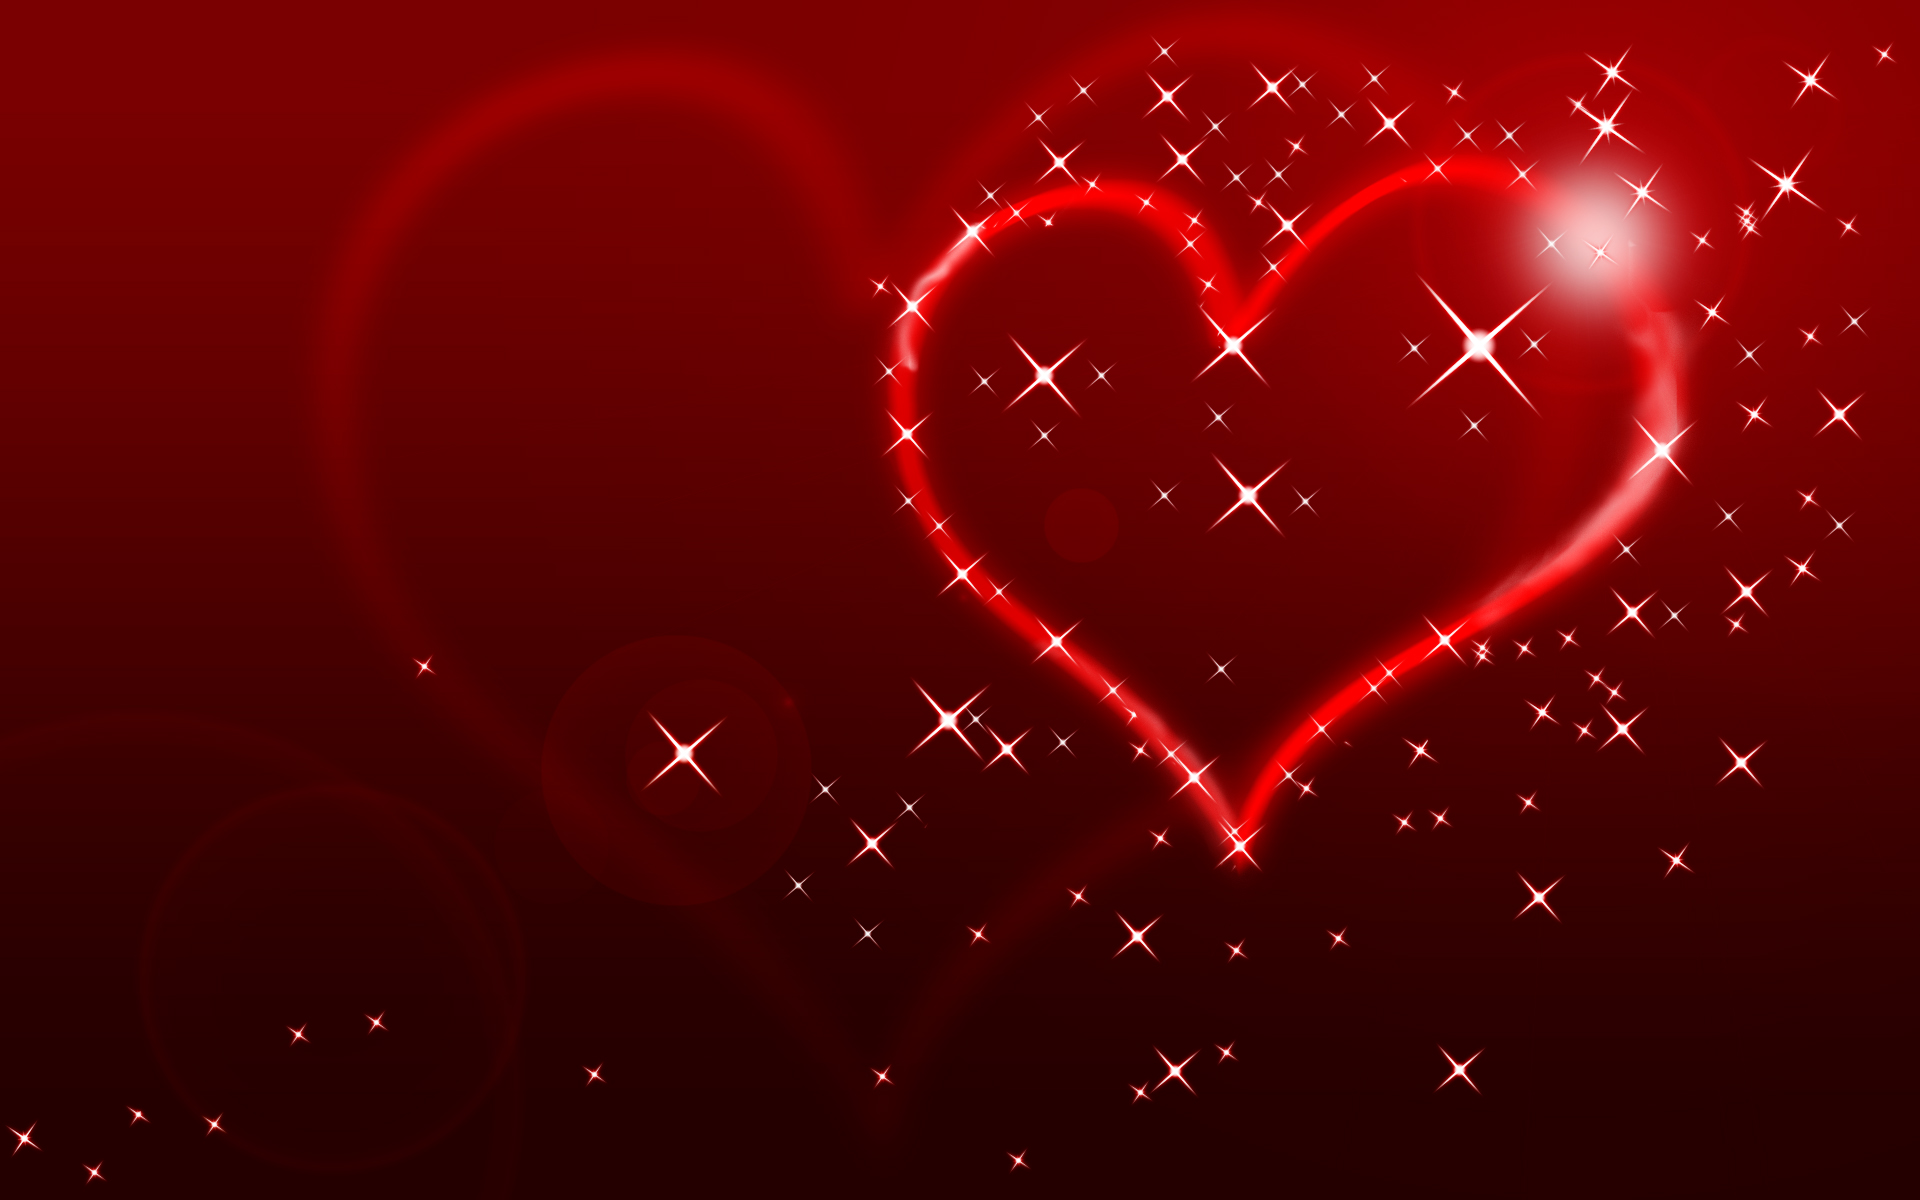 http://fc01.deviantart.net/fs70/f/2011/187/4/7/valentine__s_wallpaper_by_heshomoney-d3l6399.jpg